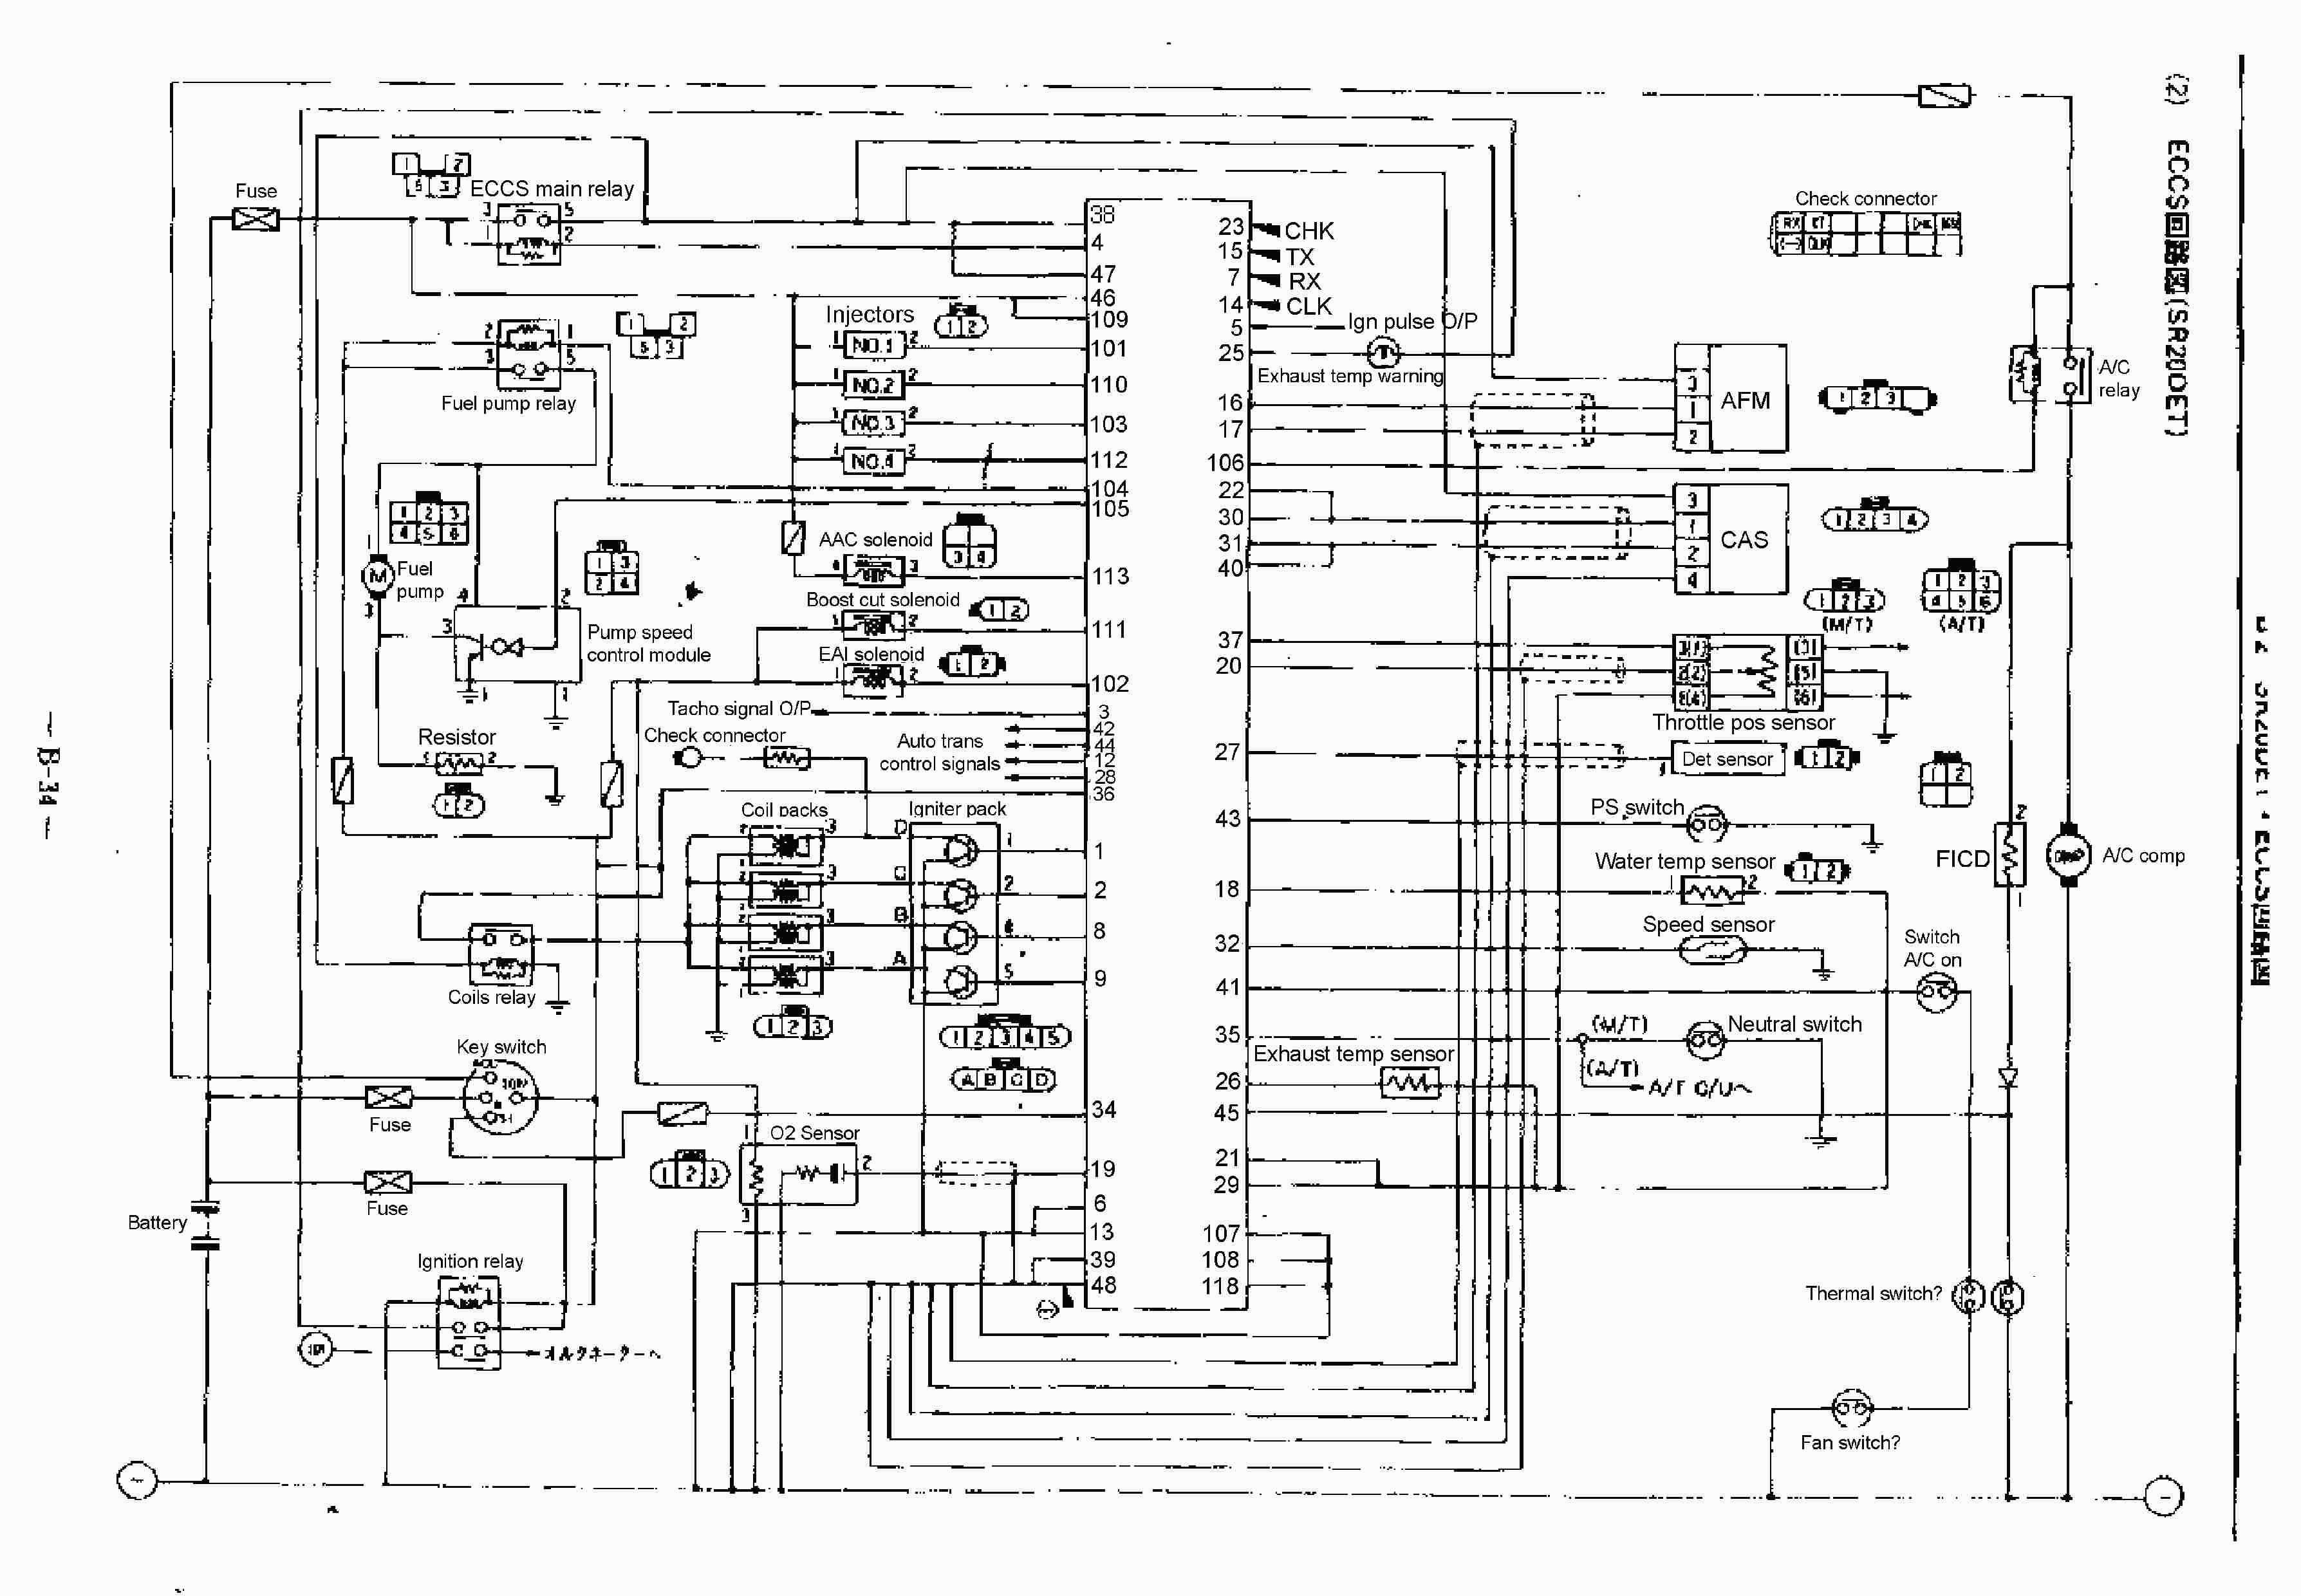 Auto Part Diagram Jaguar Dealership Fresh Car Diagram New Car Body Part Diagram Used Of Auto Part Diagram